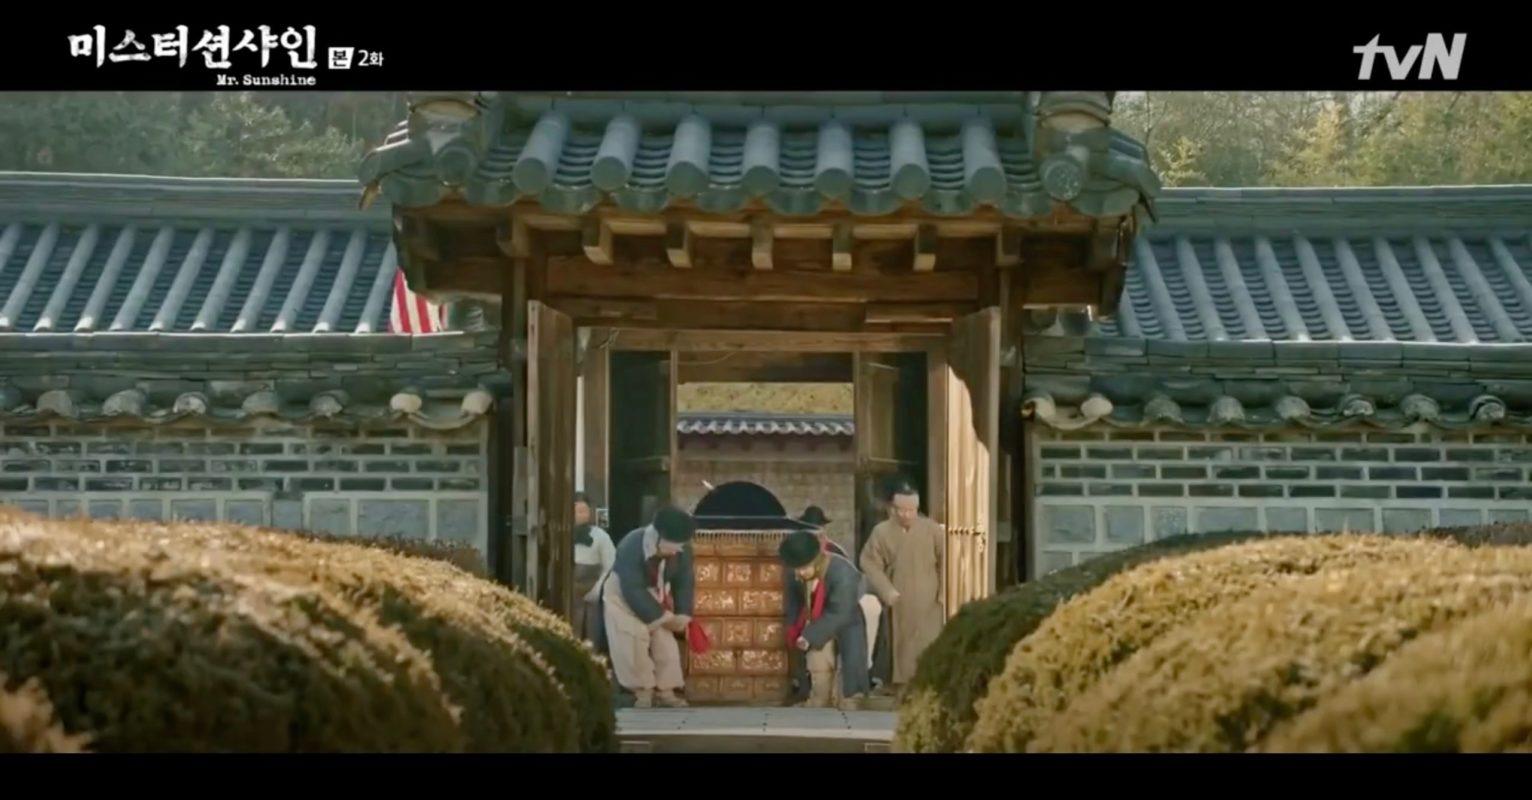 House of Unbo [운보의 집] – Korean Dramaland